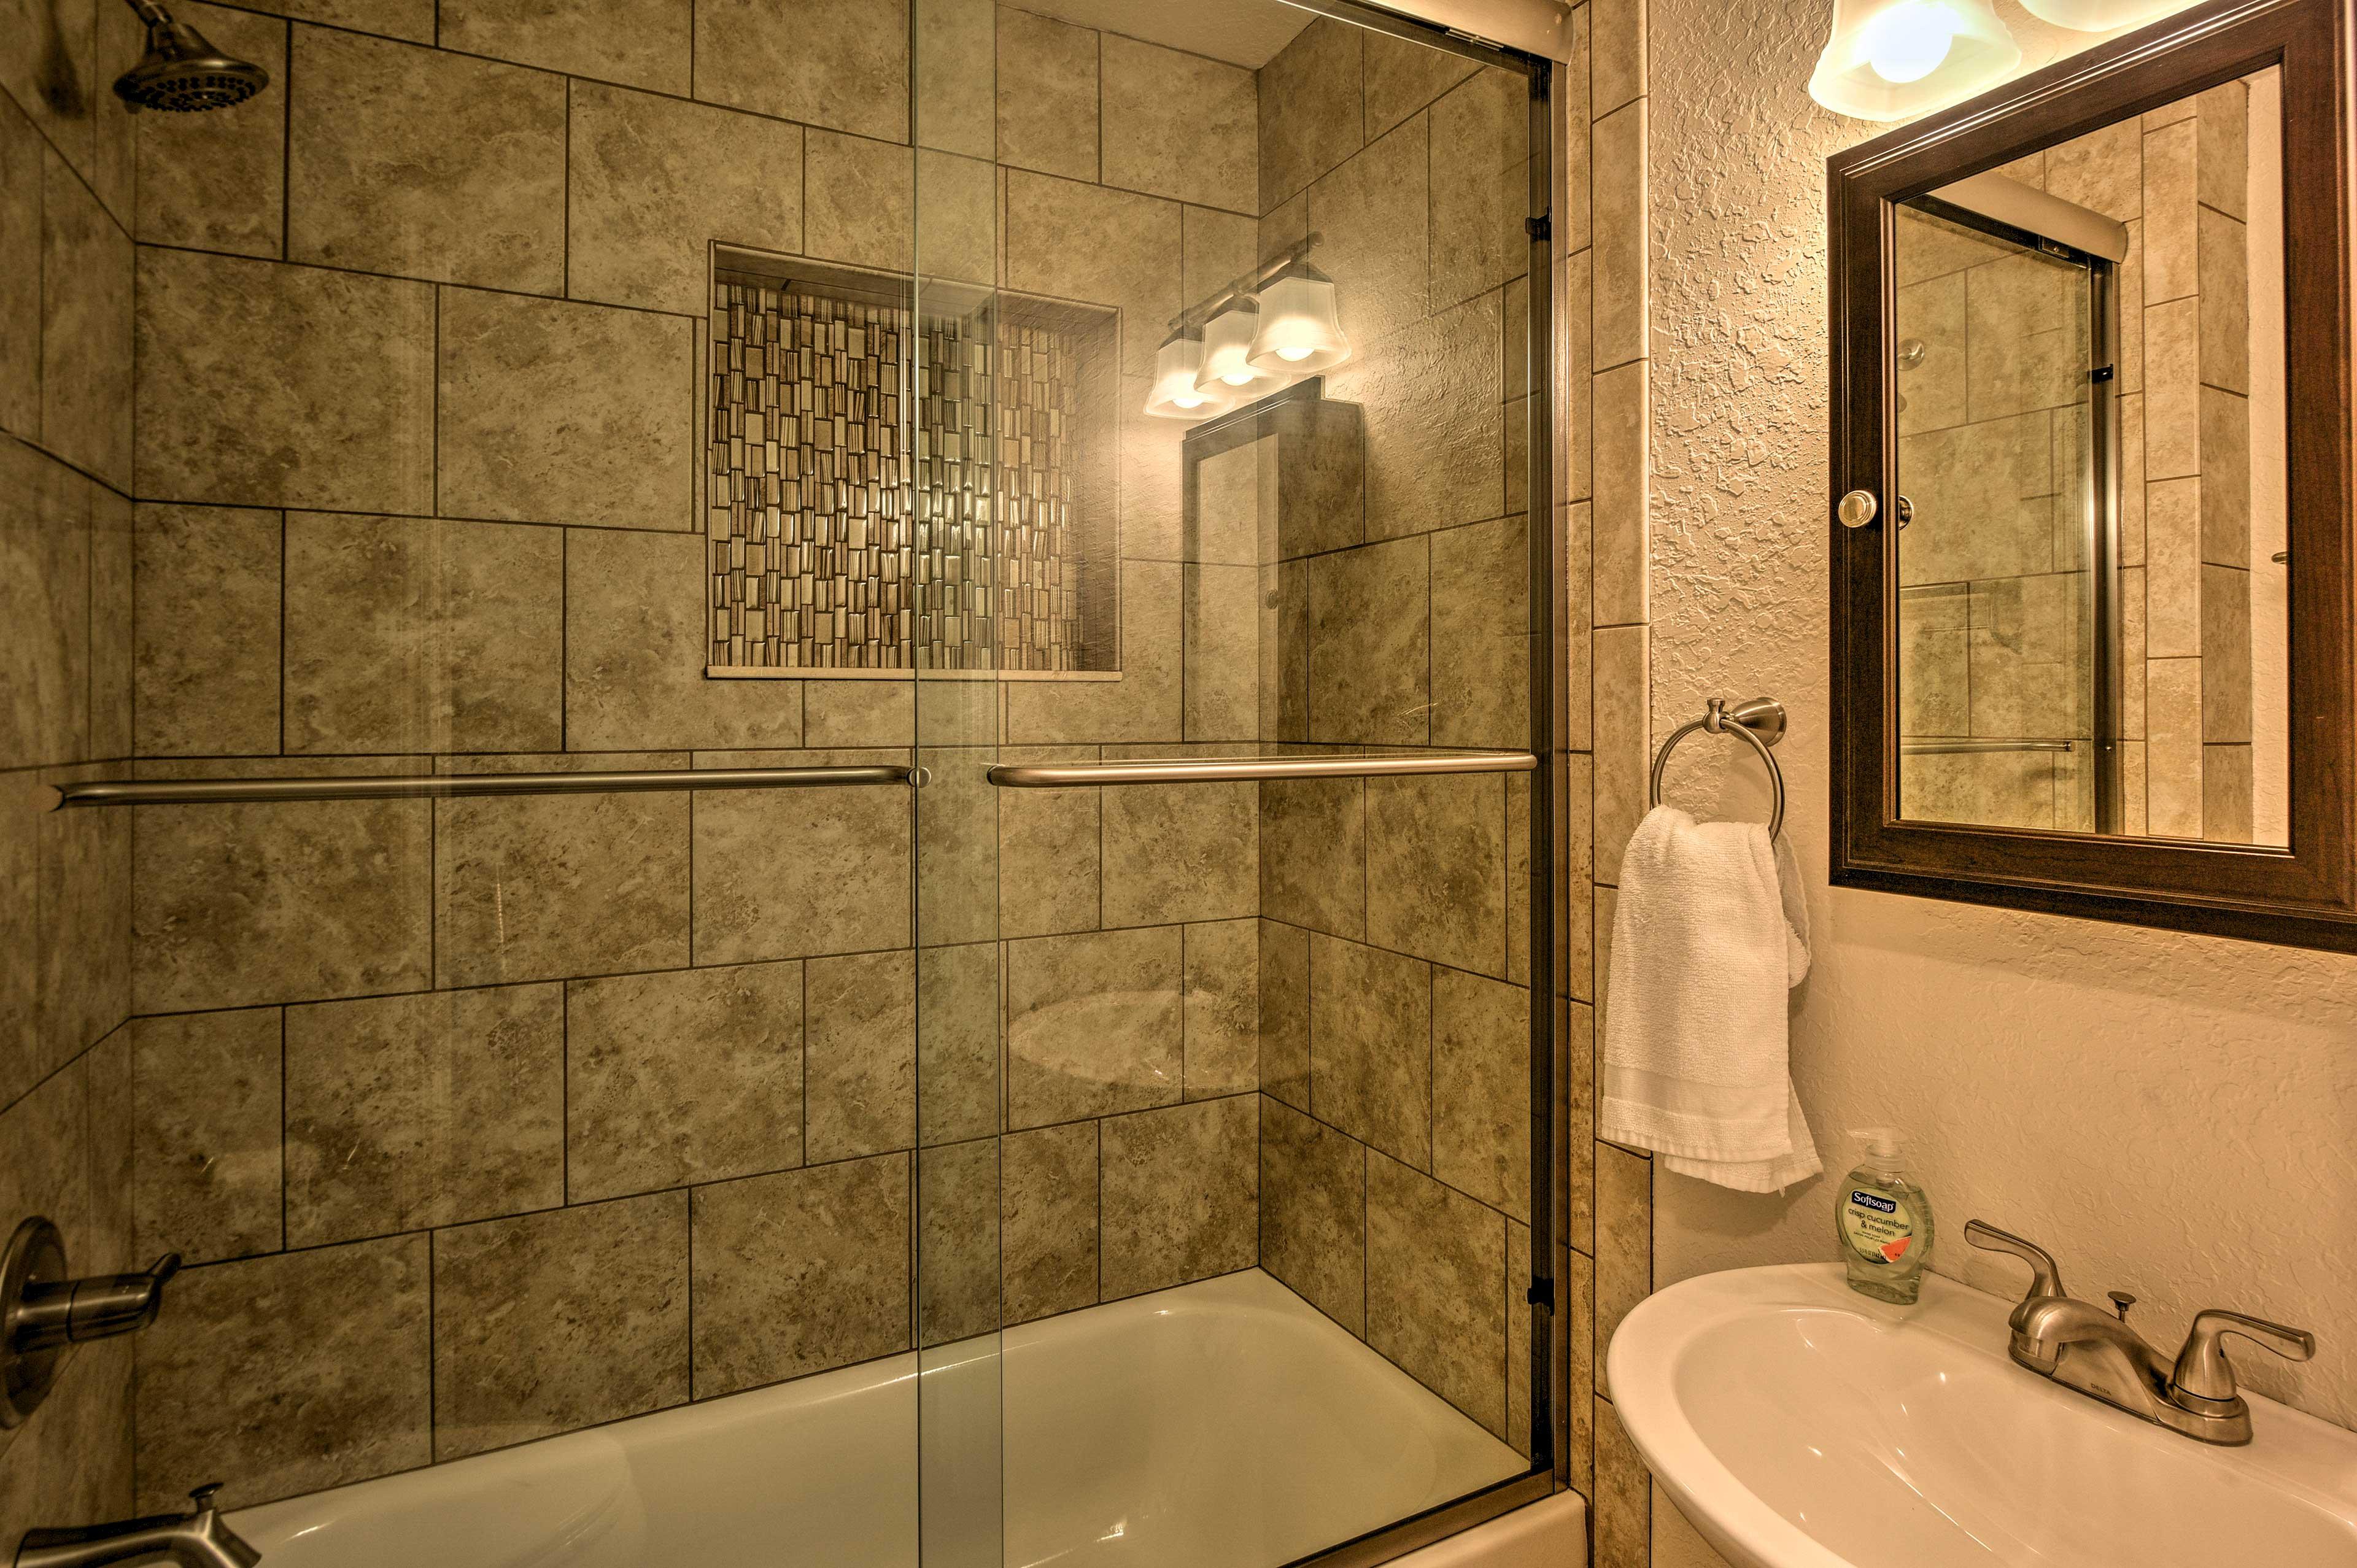 Enjoy a hot shower or a long soak in the tub.